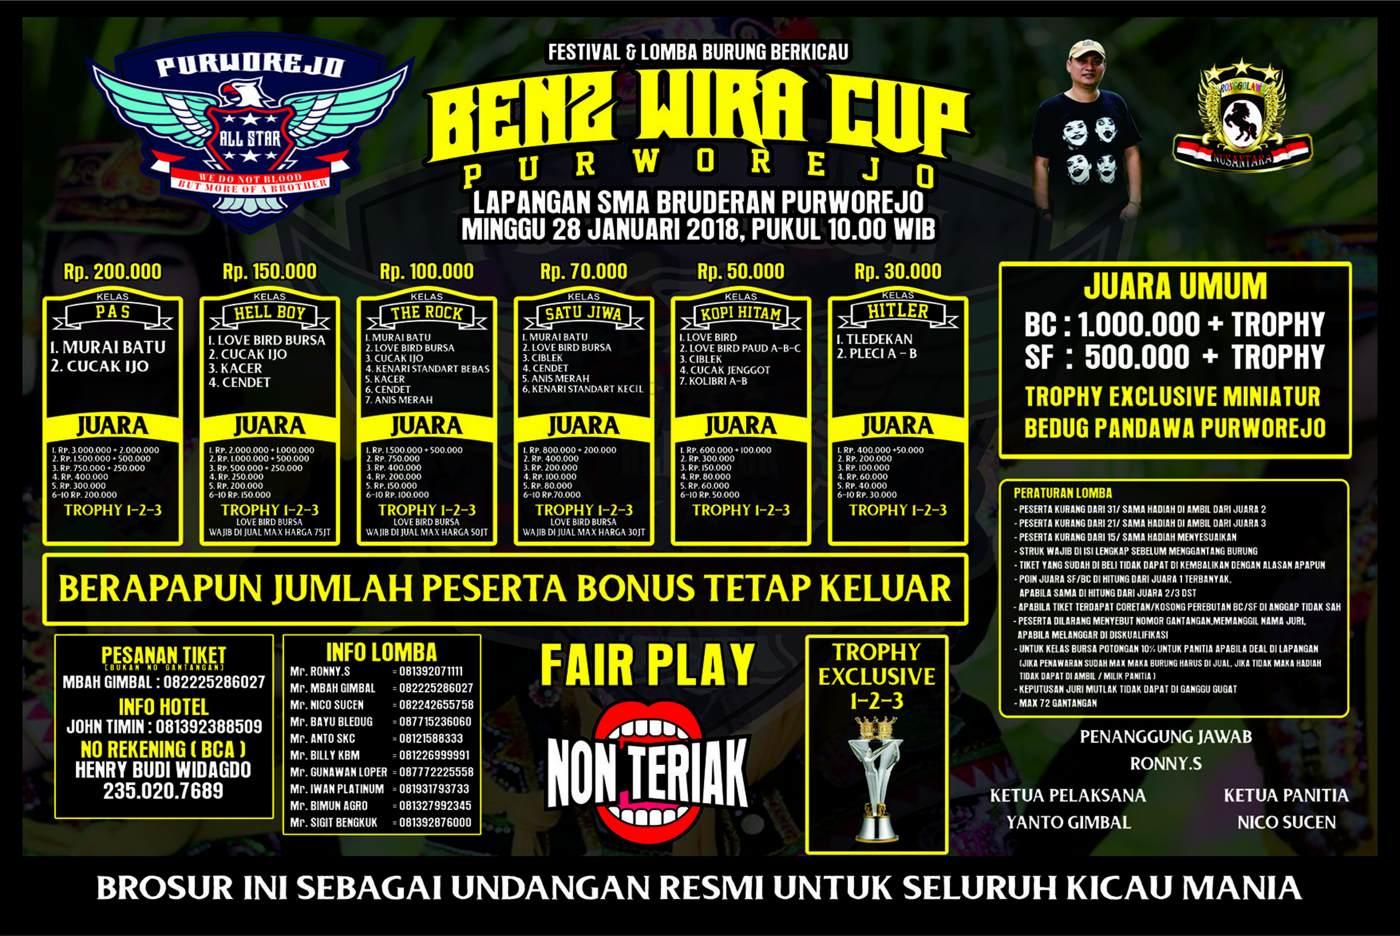 Brosur BENZ WIRA CUP Purworejo, 28 Januari Revisi